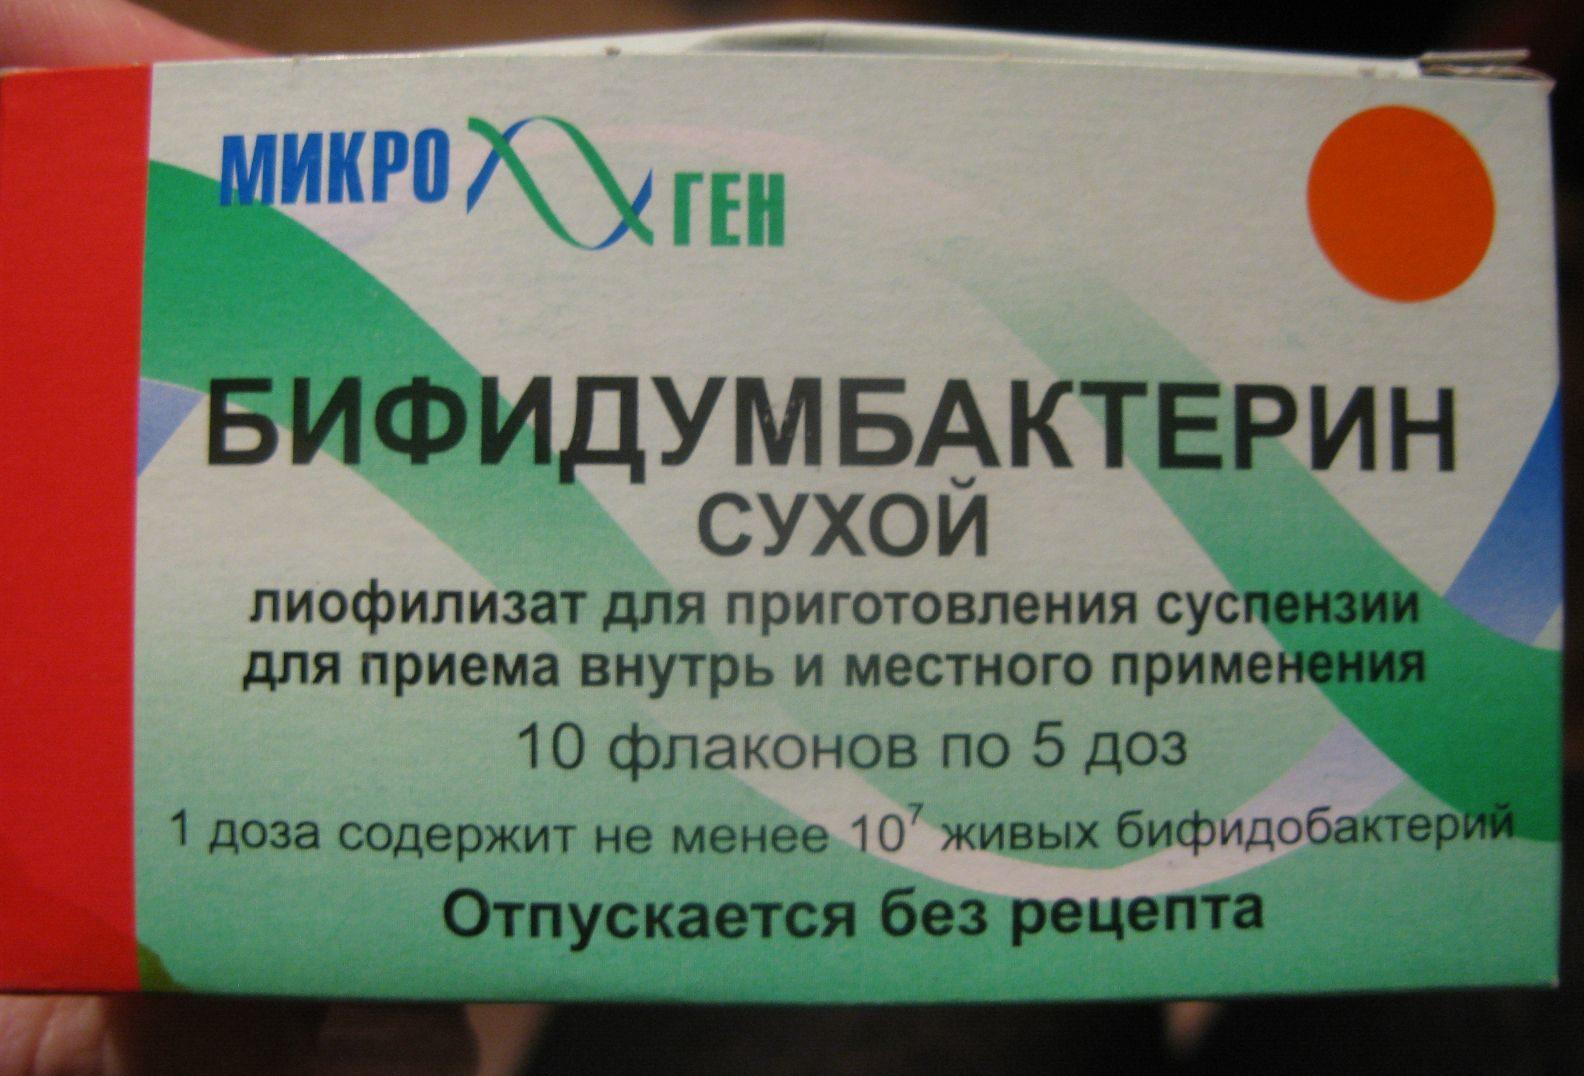 Бифидумбактерин при вздутии живота: инструкция по применению